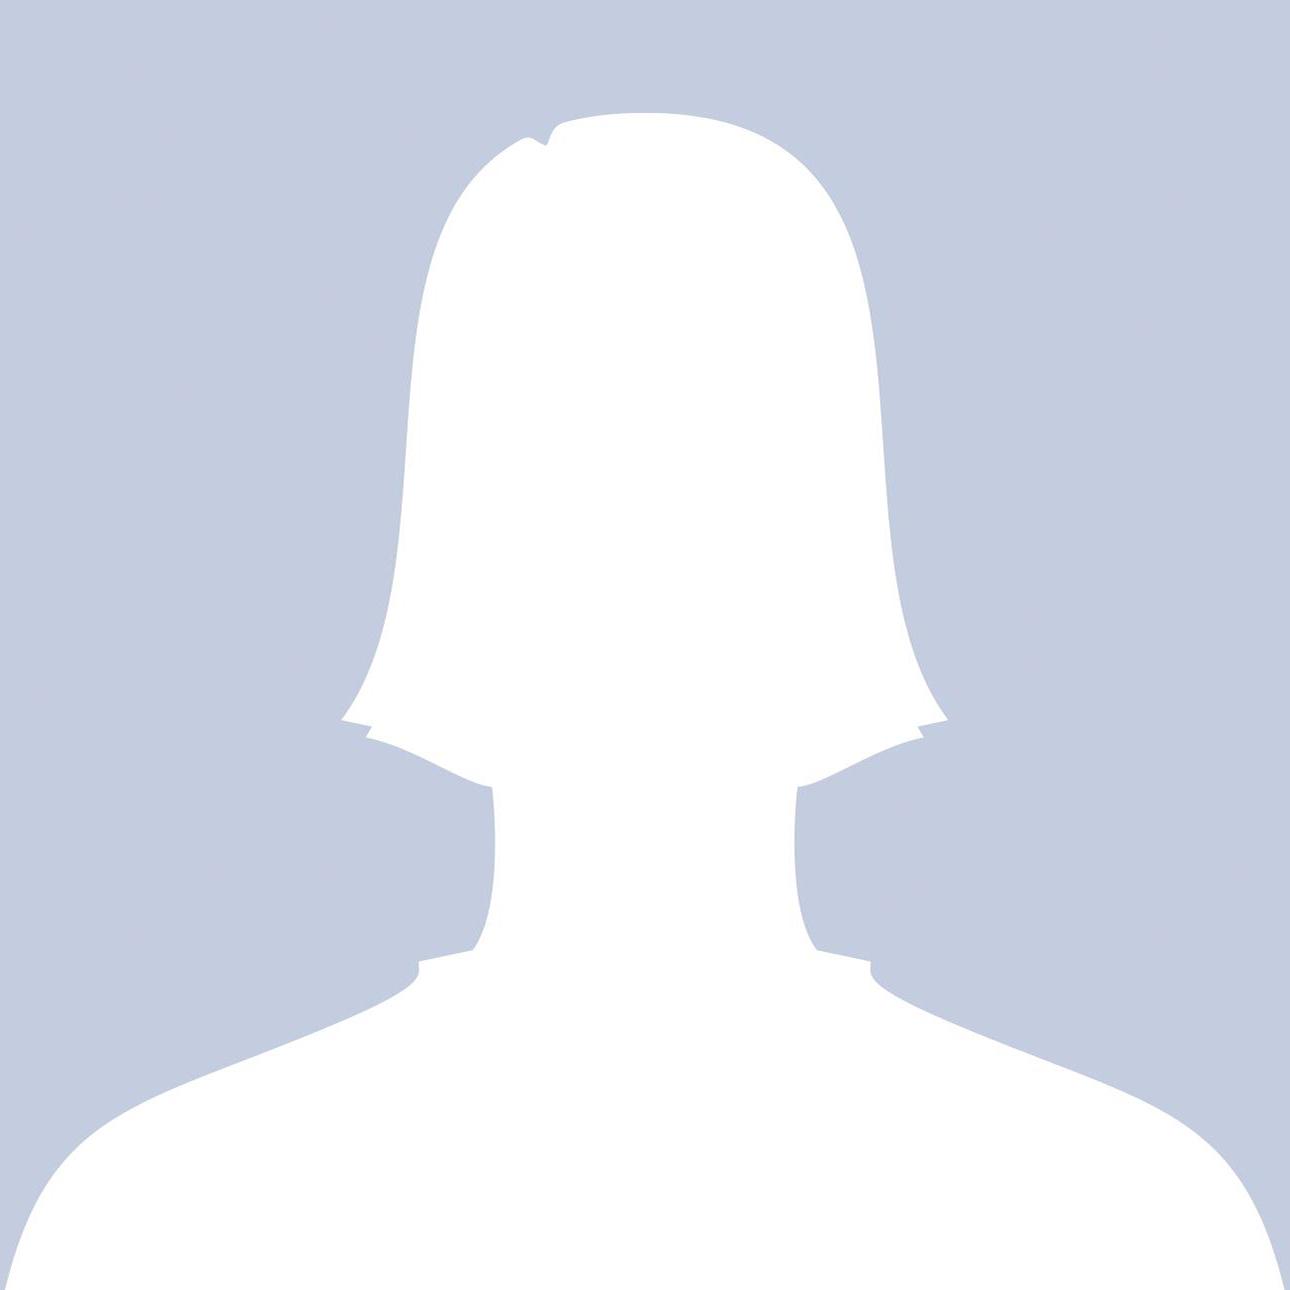 Blank_profile_female